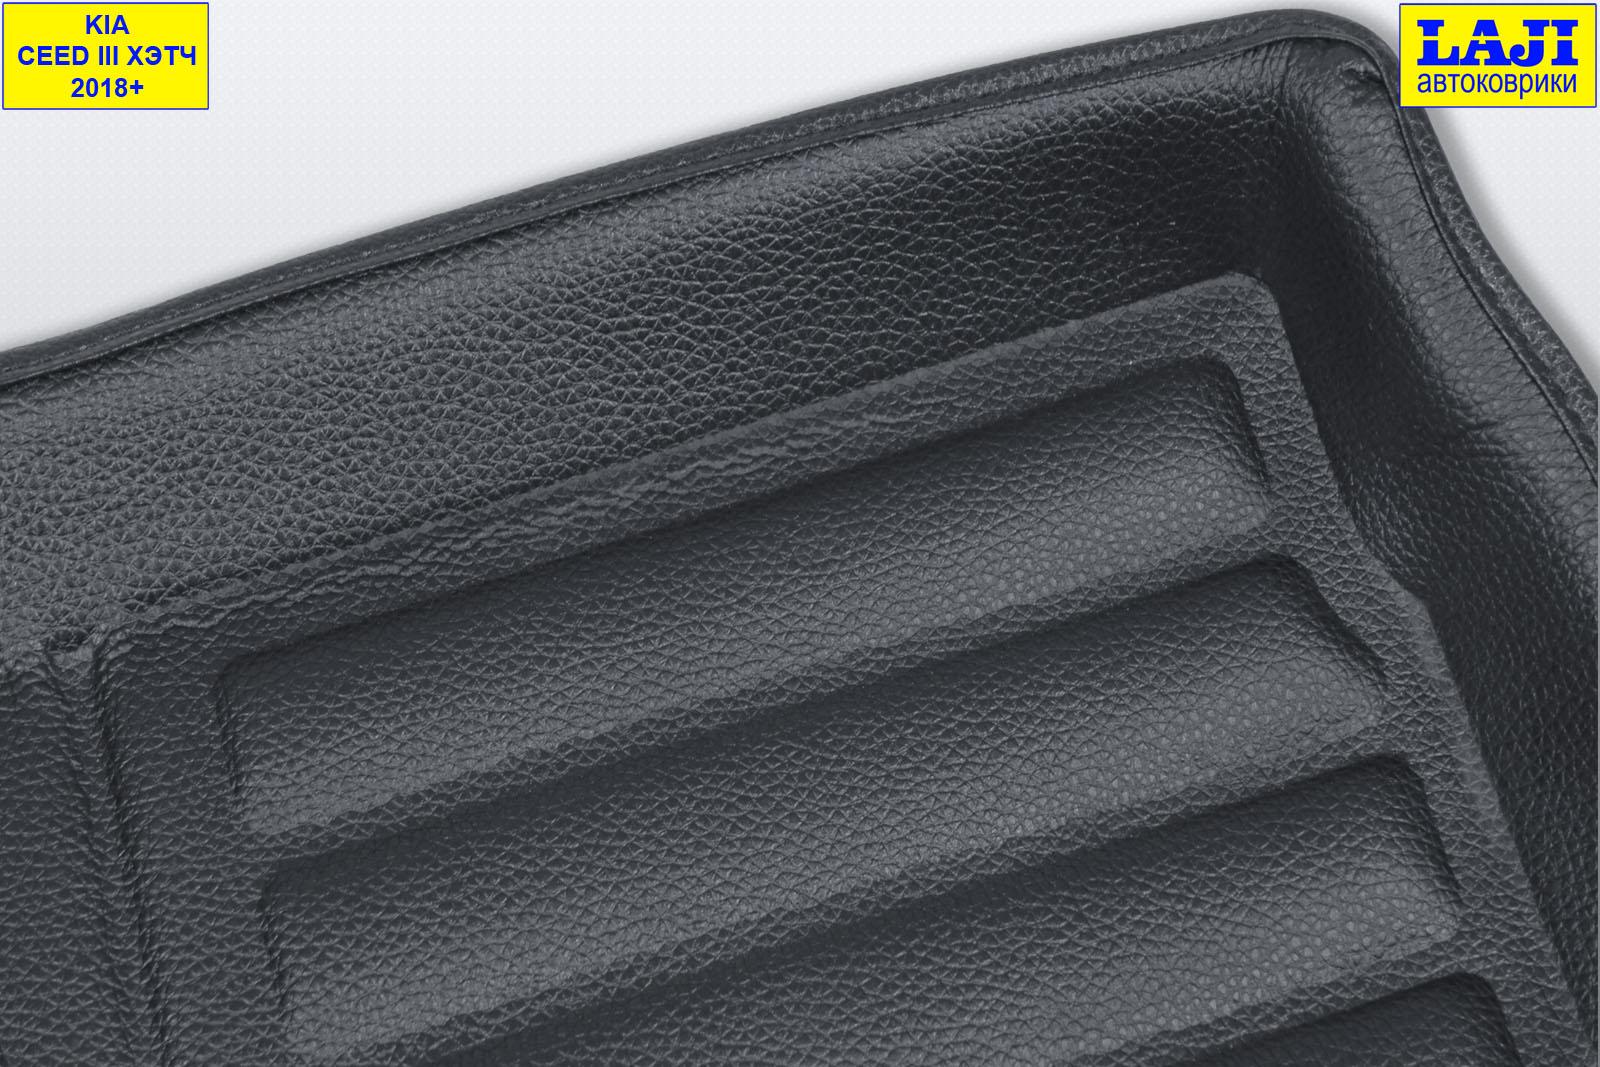 3D коврик в багажник Kia Ceed III хэтчбек 2018-н.в. 4